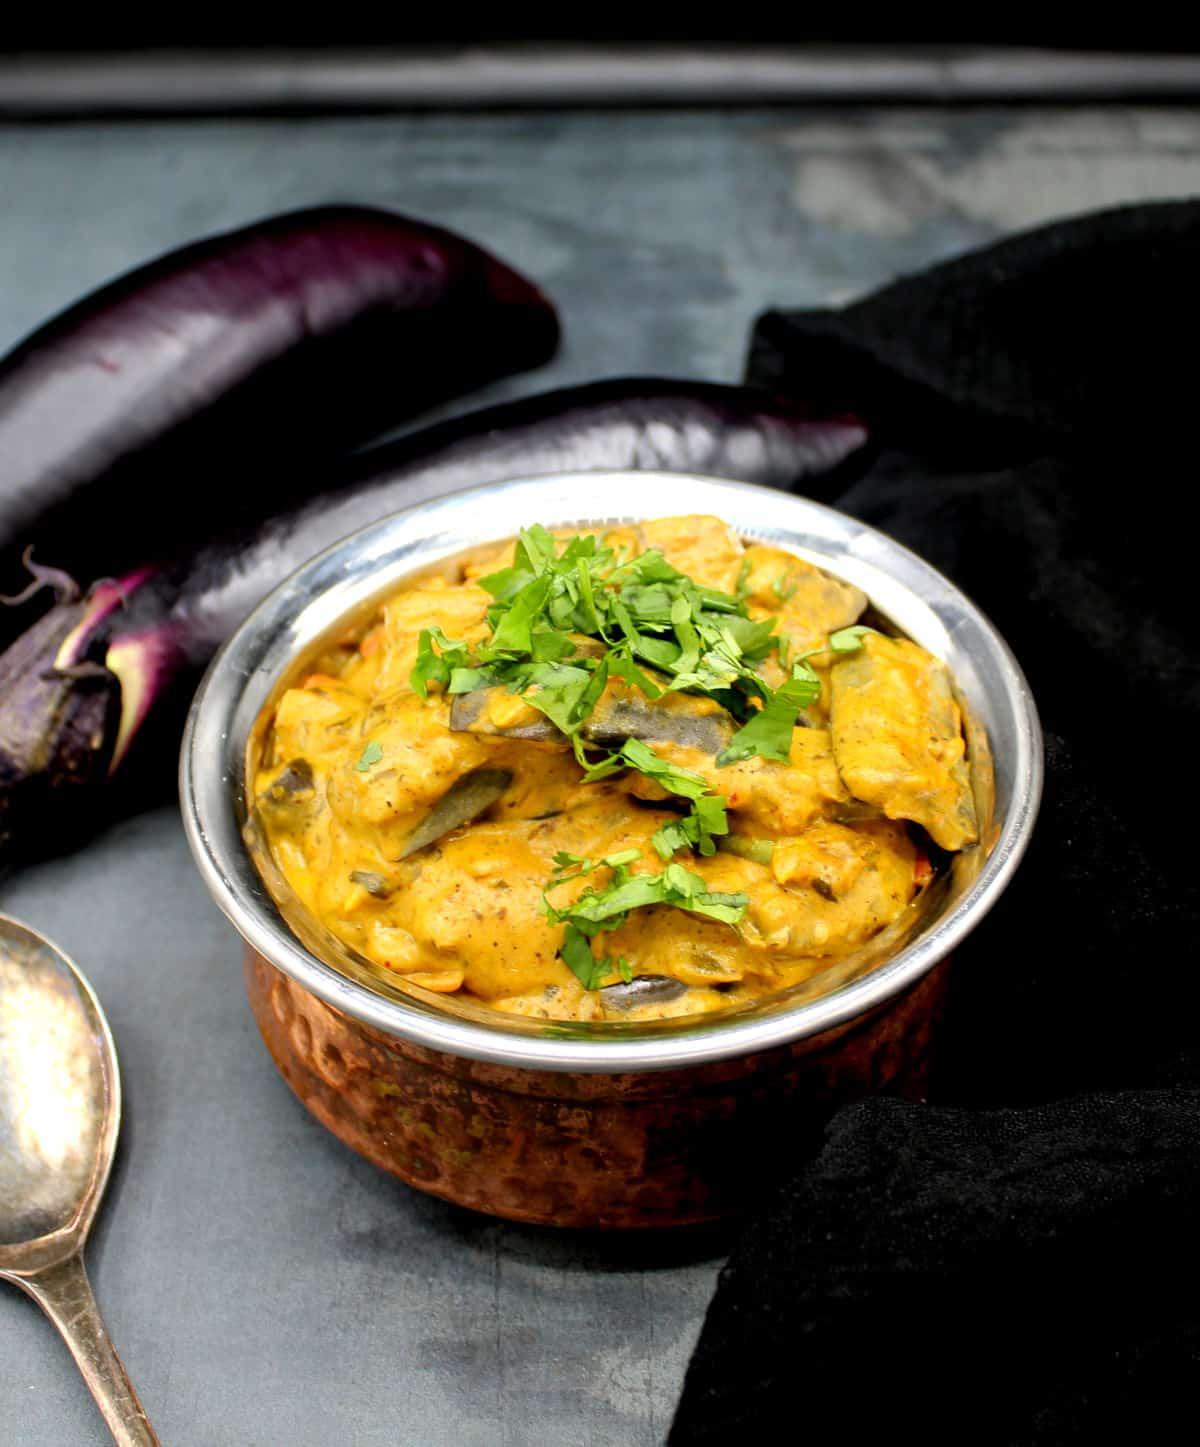 Front photo of vegan dahi baingan with cilantro garnish and eggplants and a steel spoon around it.